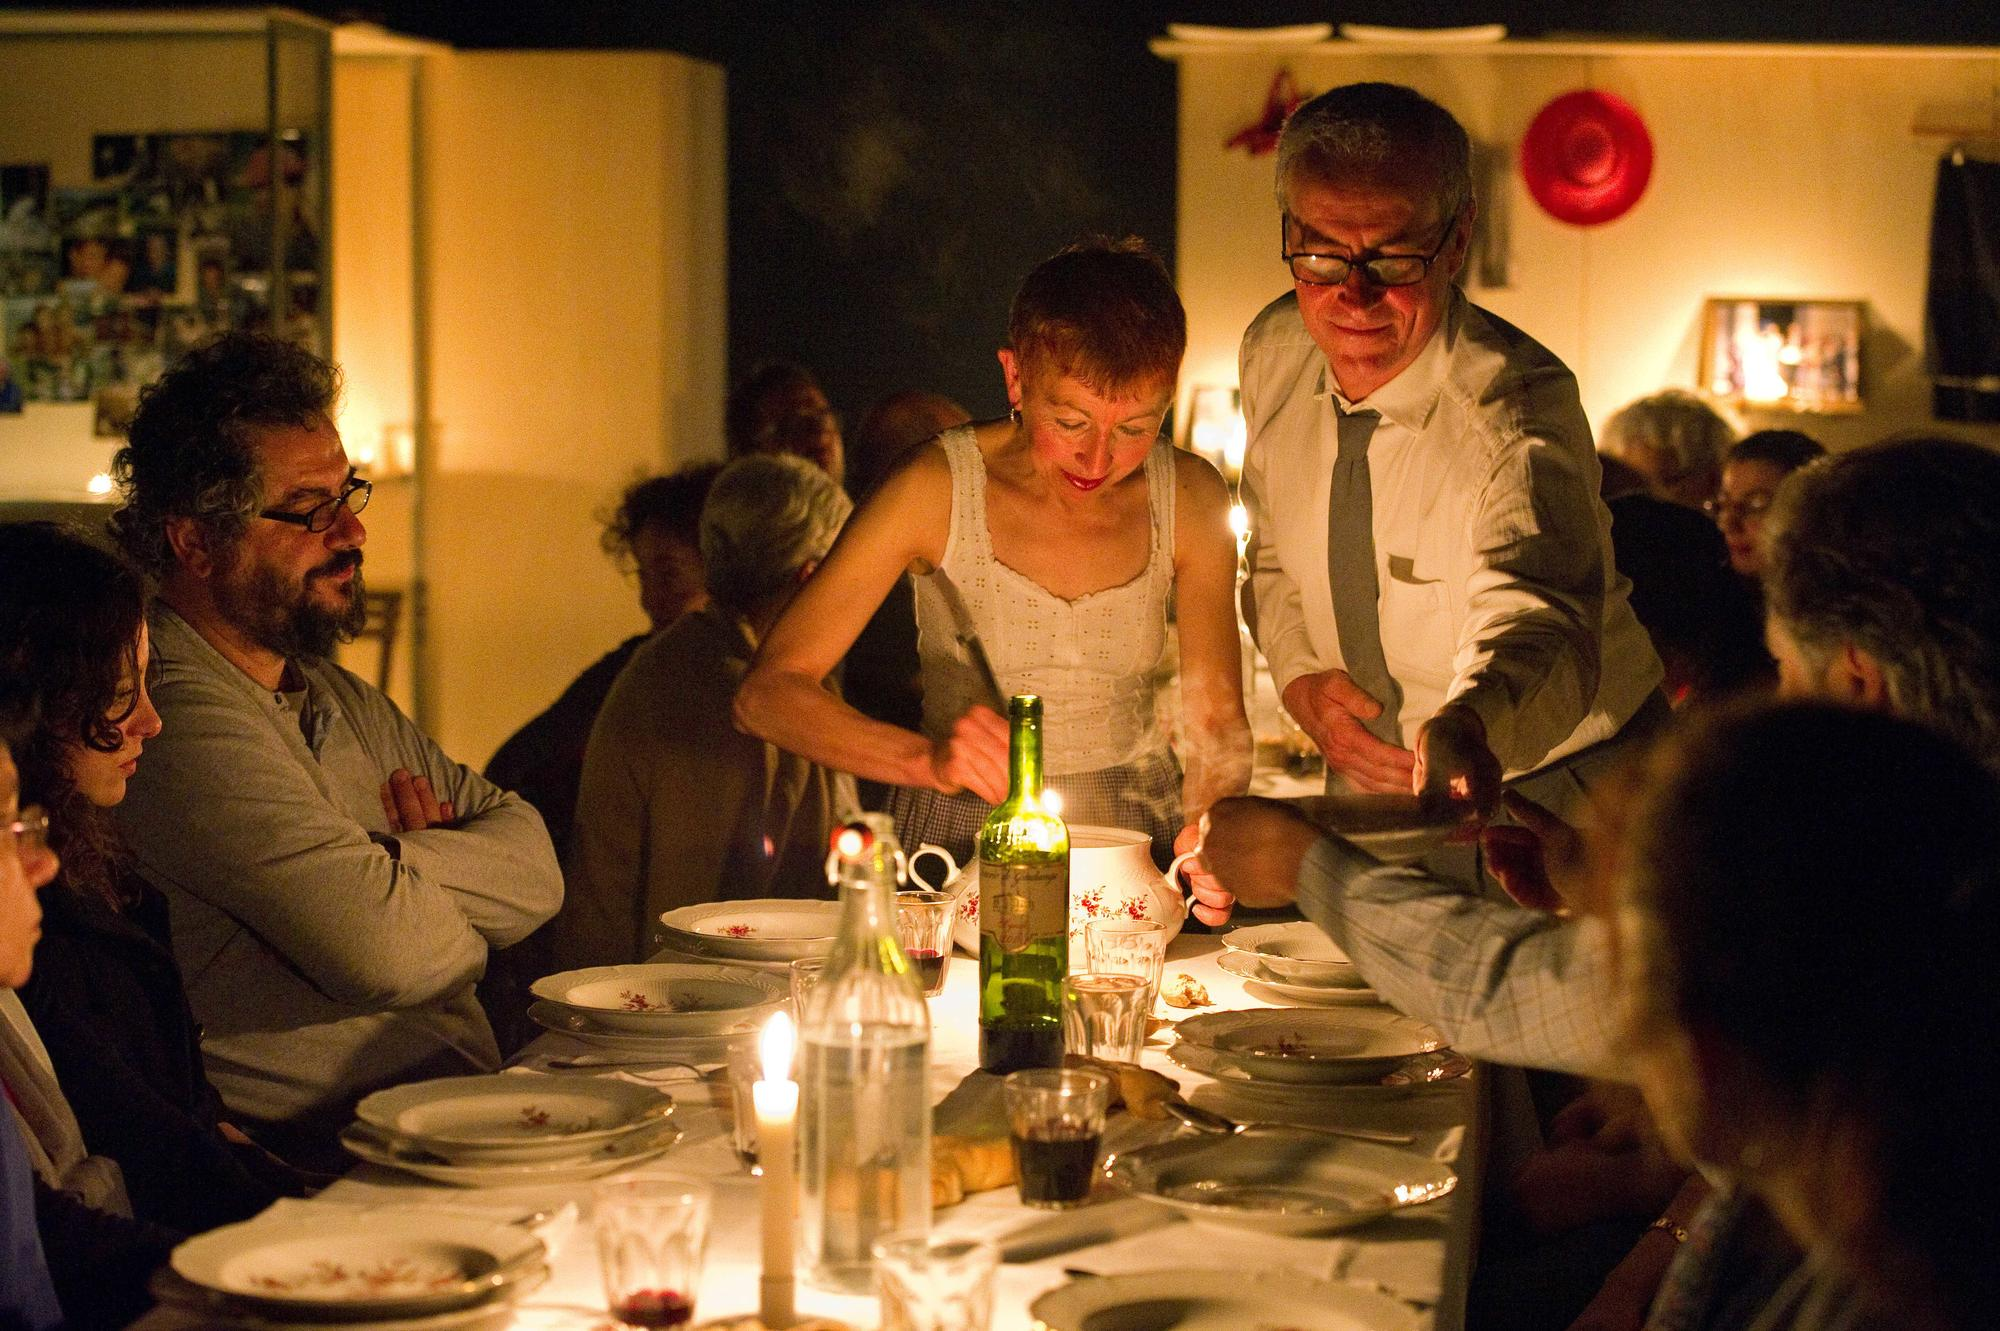 Mariage d'Hiver Journal intime - Teatro delle Ariette